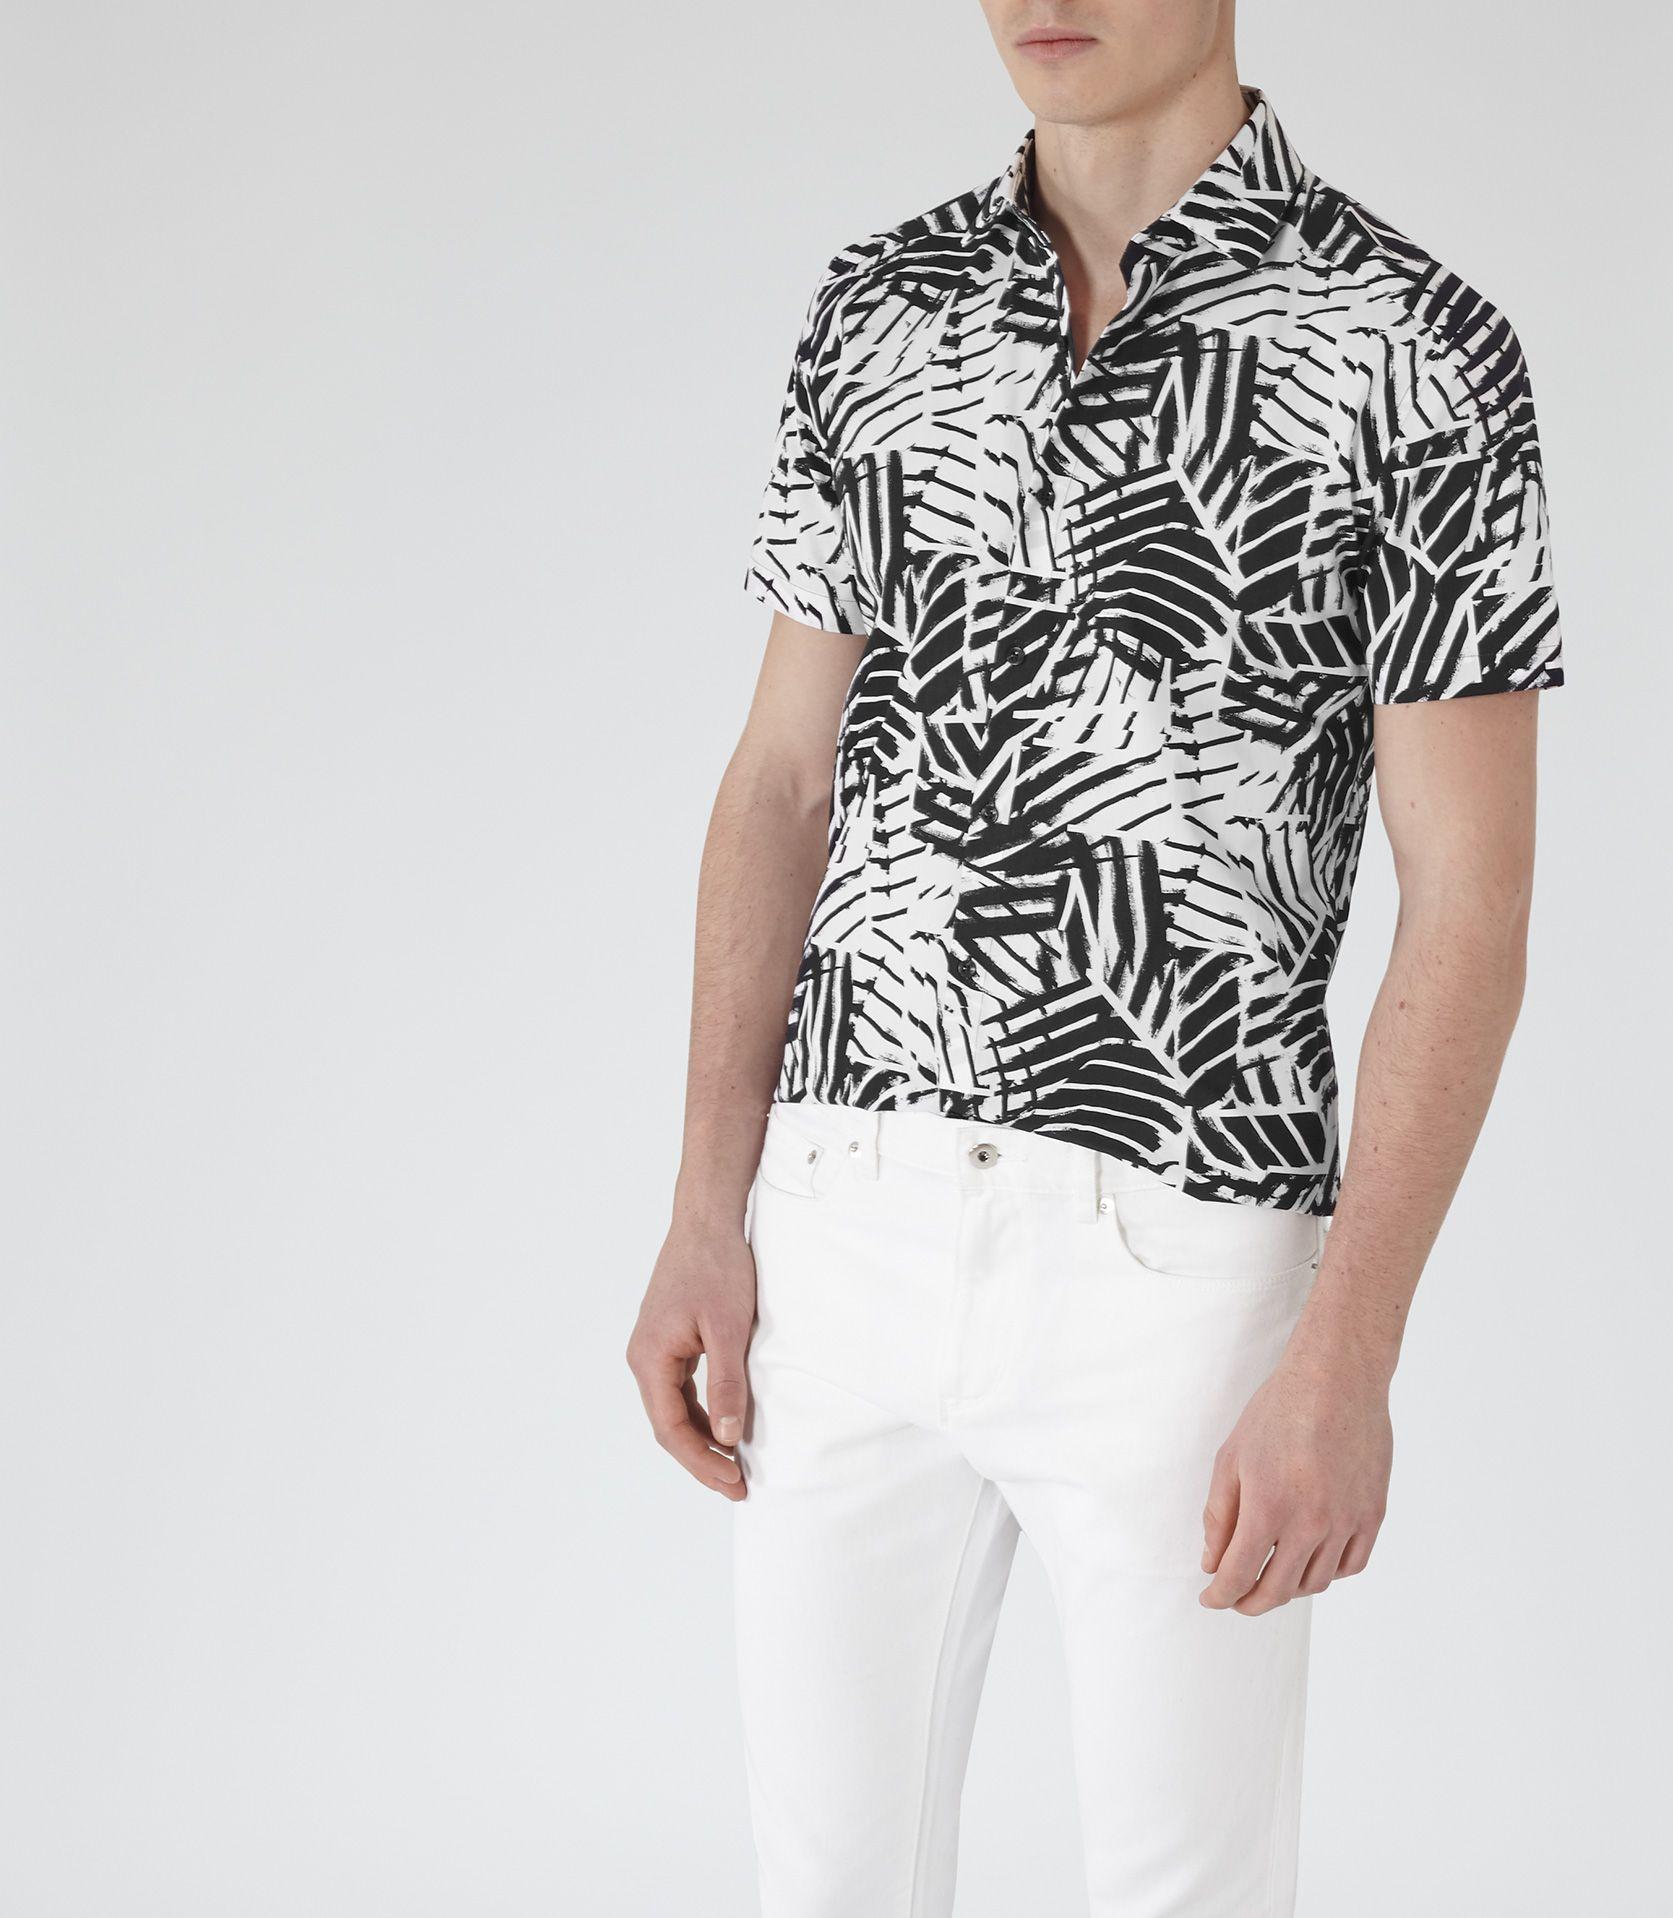 Black t shirt reiss - Mens Black Palm Print Shirt Reiss Martian